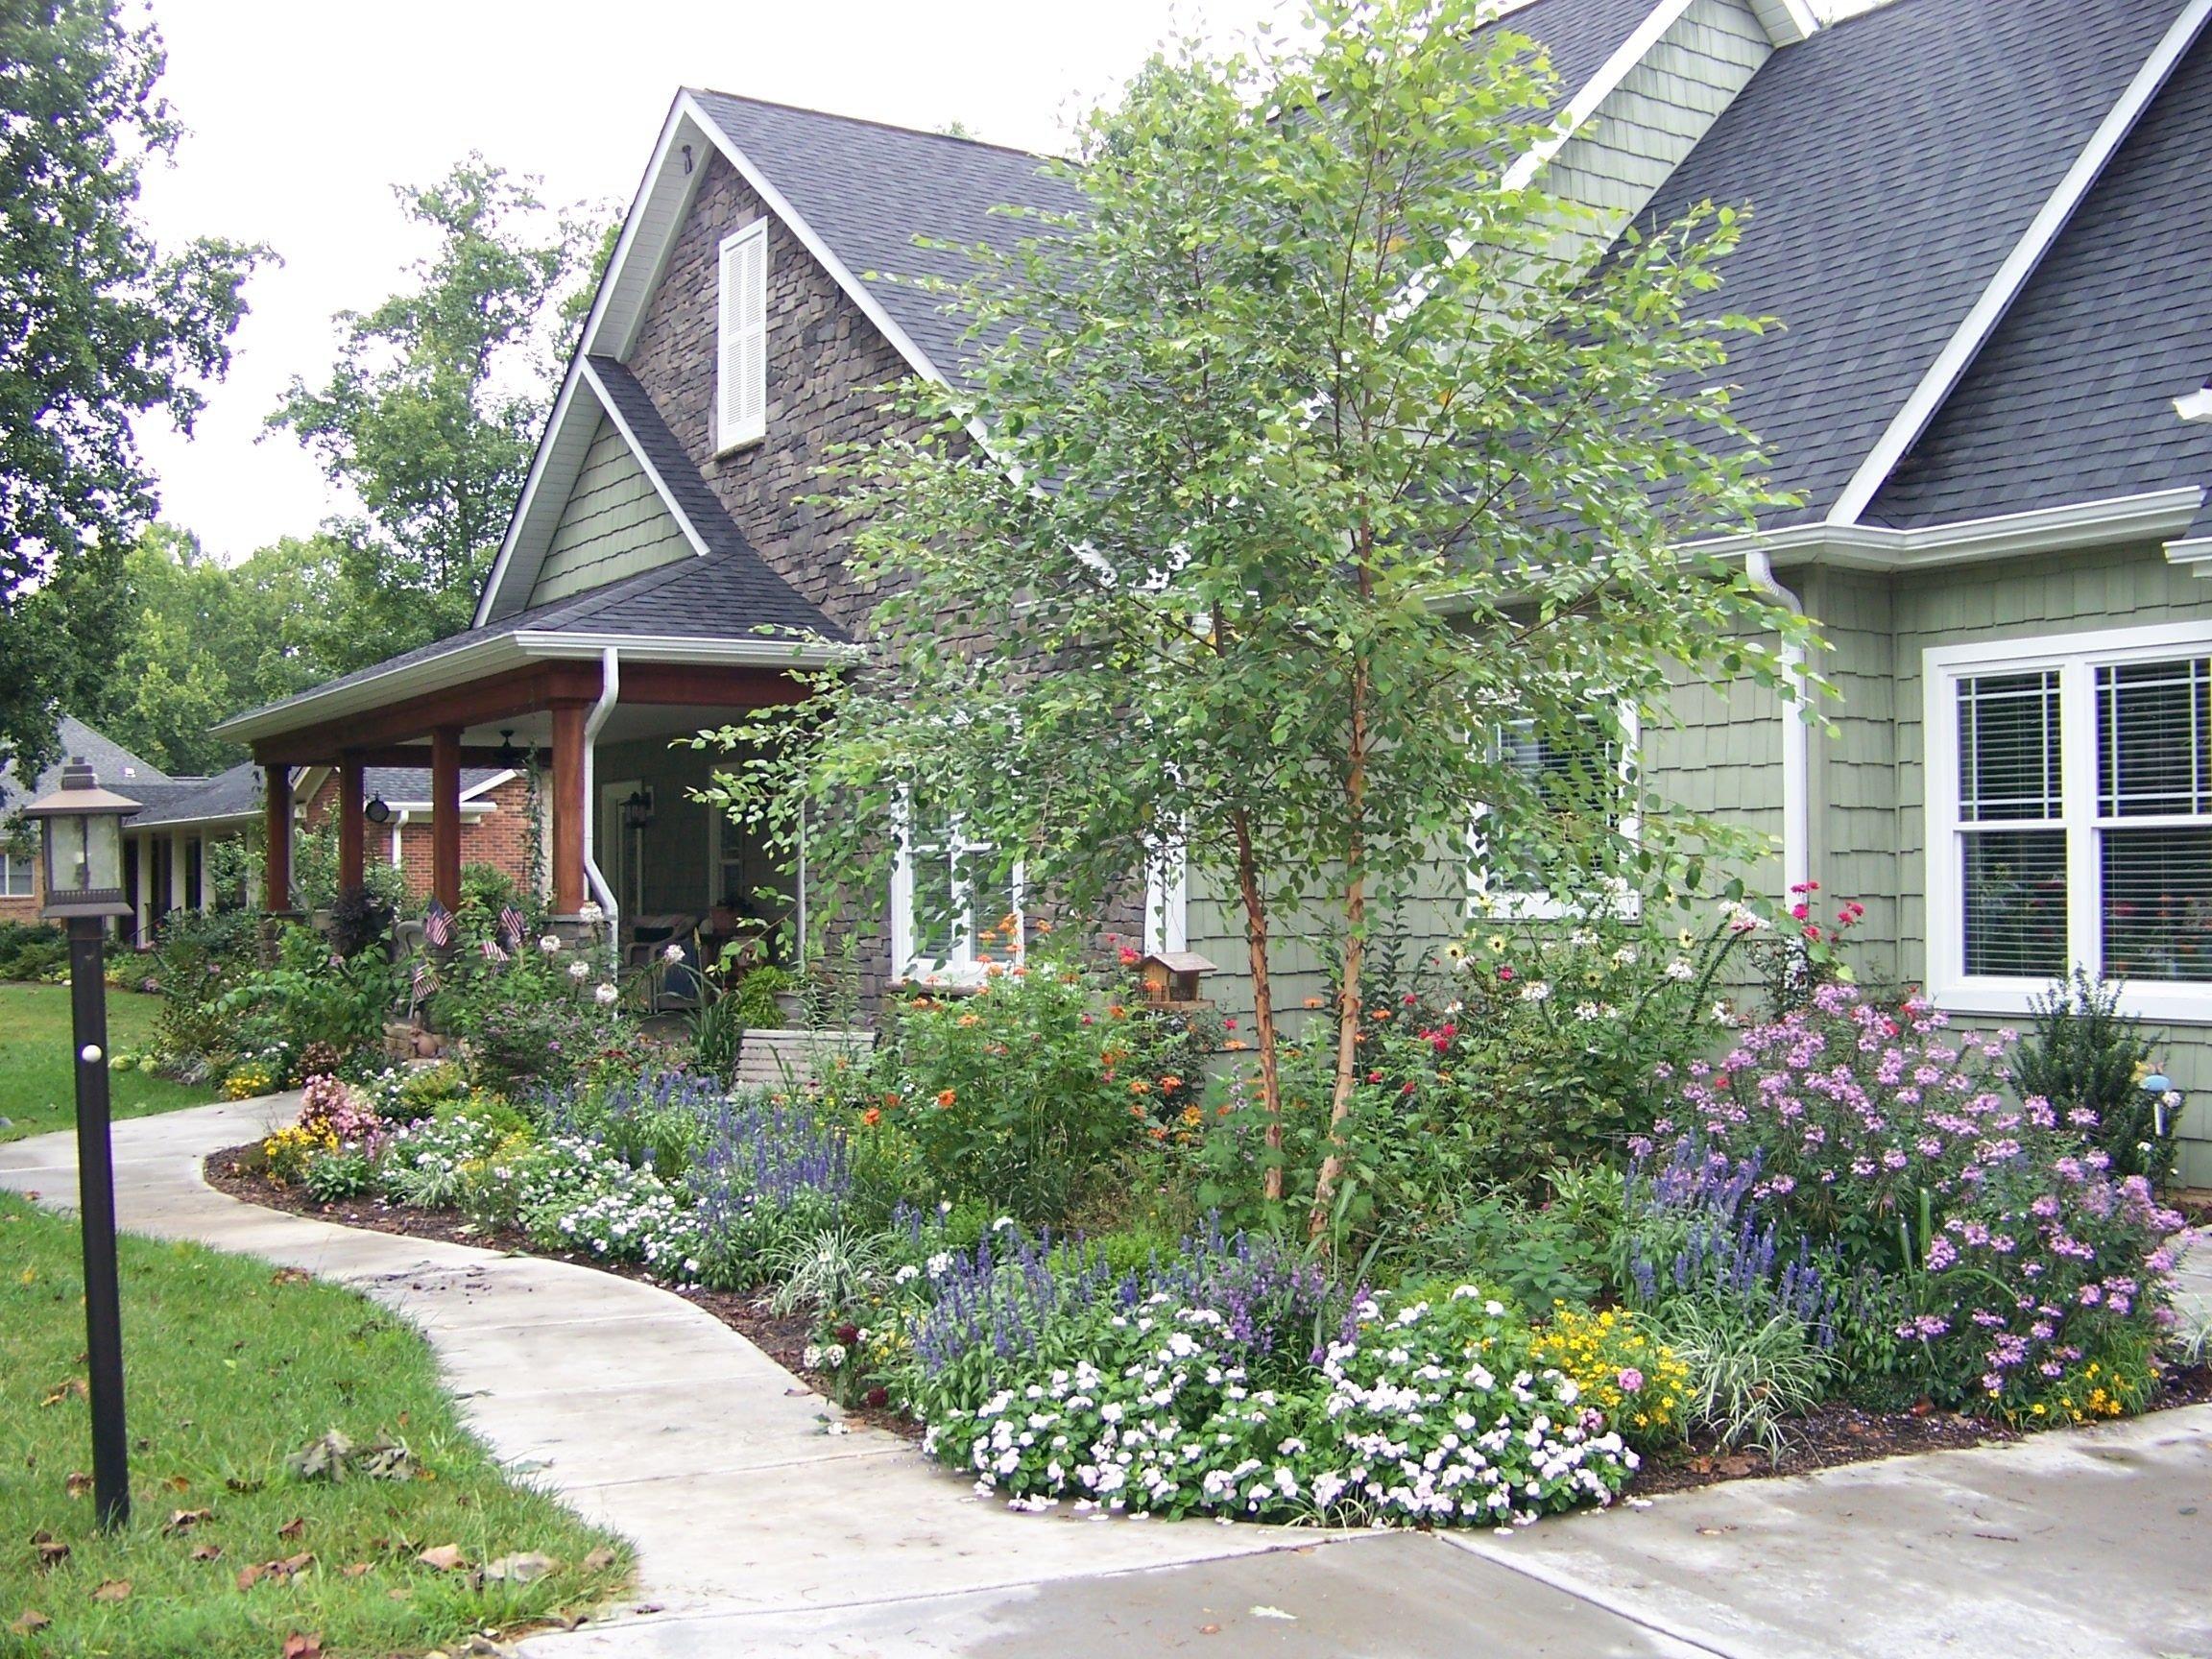 10 Fantastic Cottage Landscaping Ideas For Front Yard landscape ideas landscape design forum gardenweb heritage river